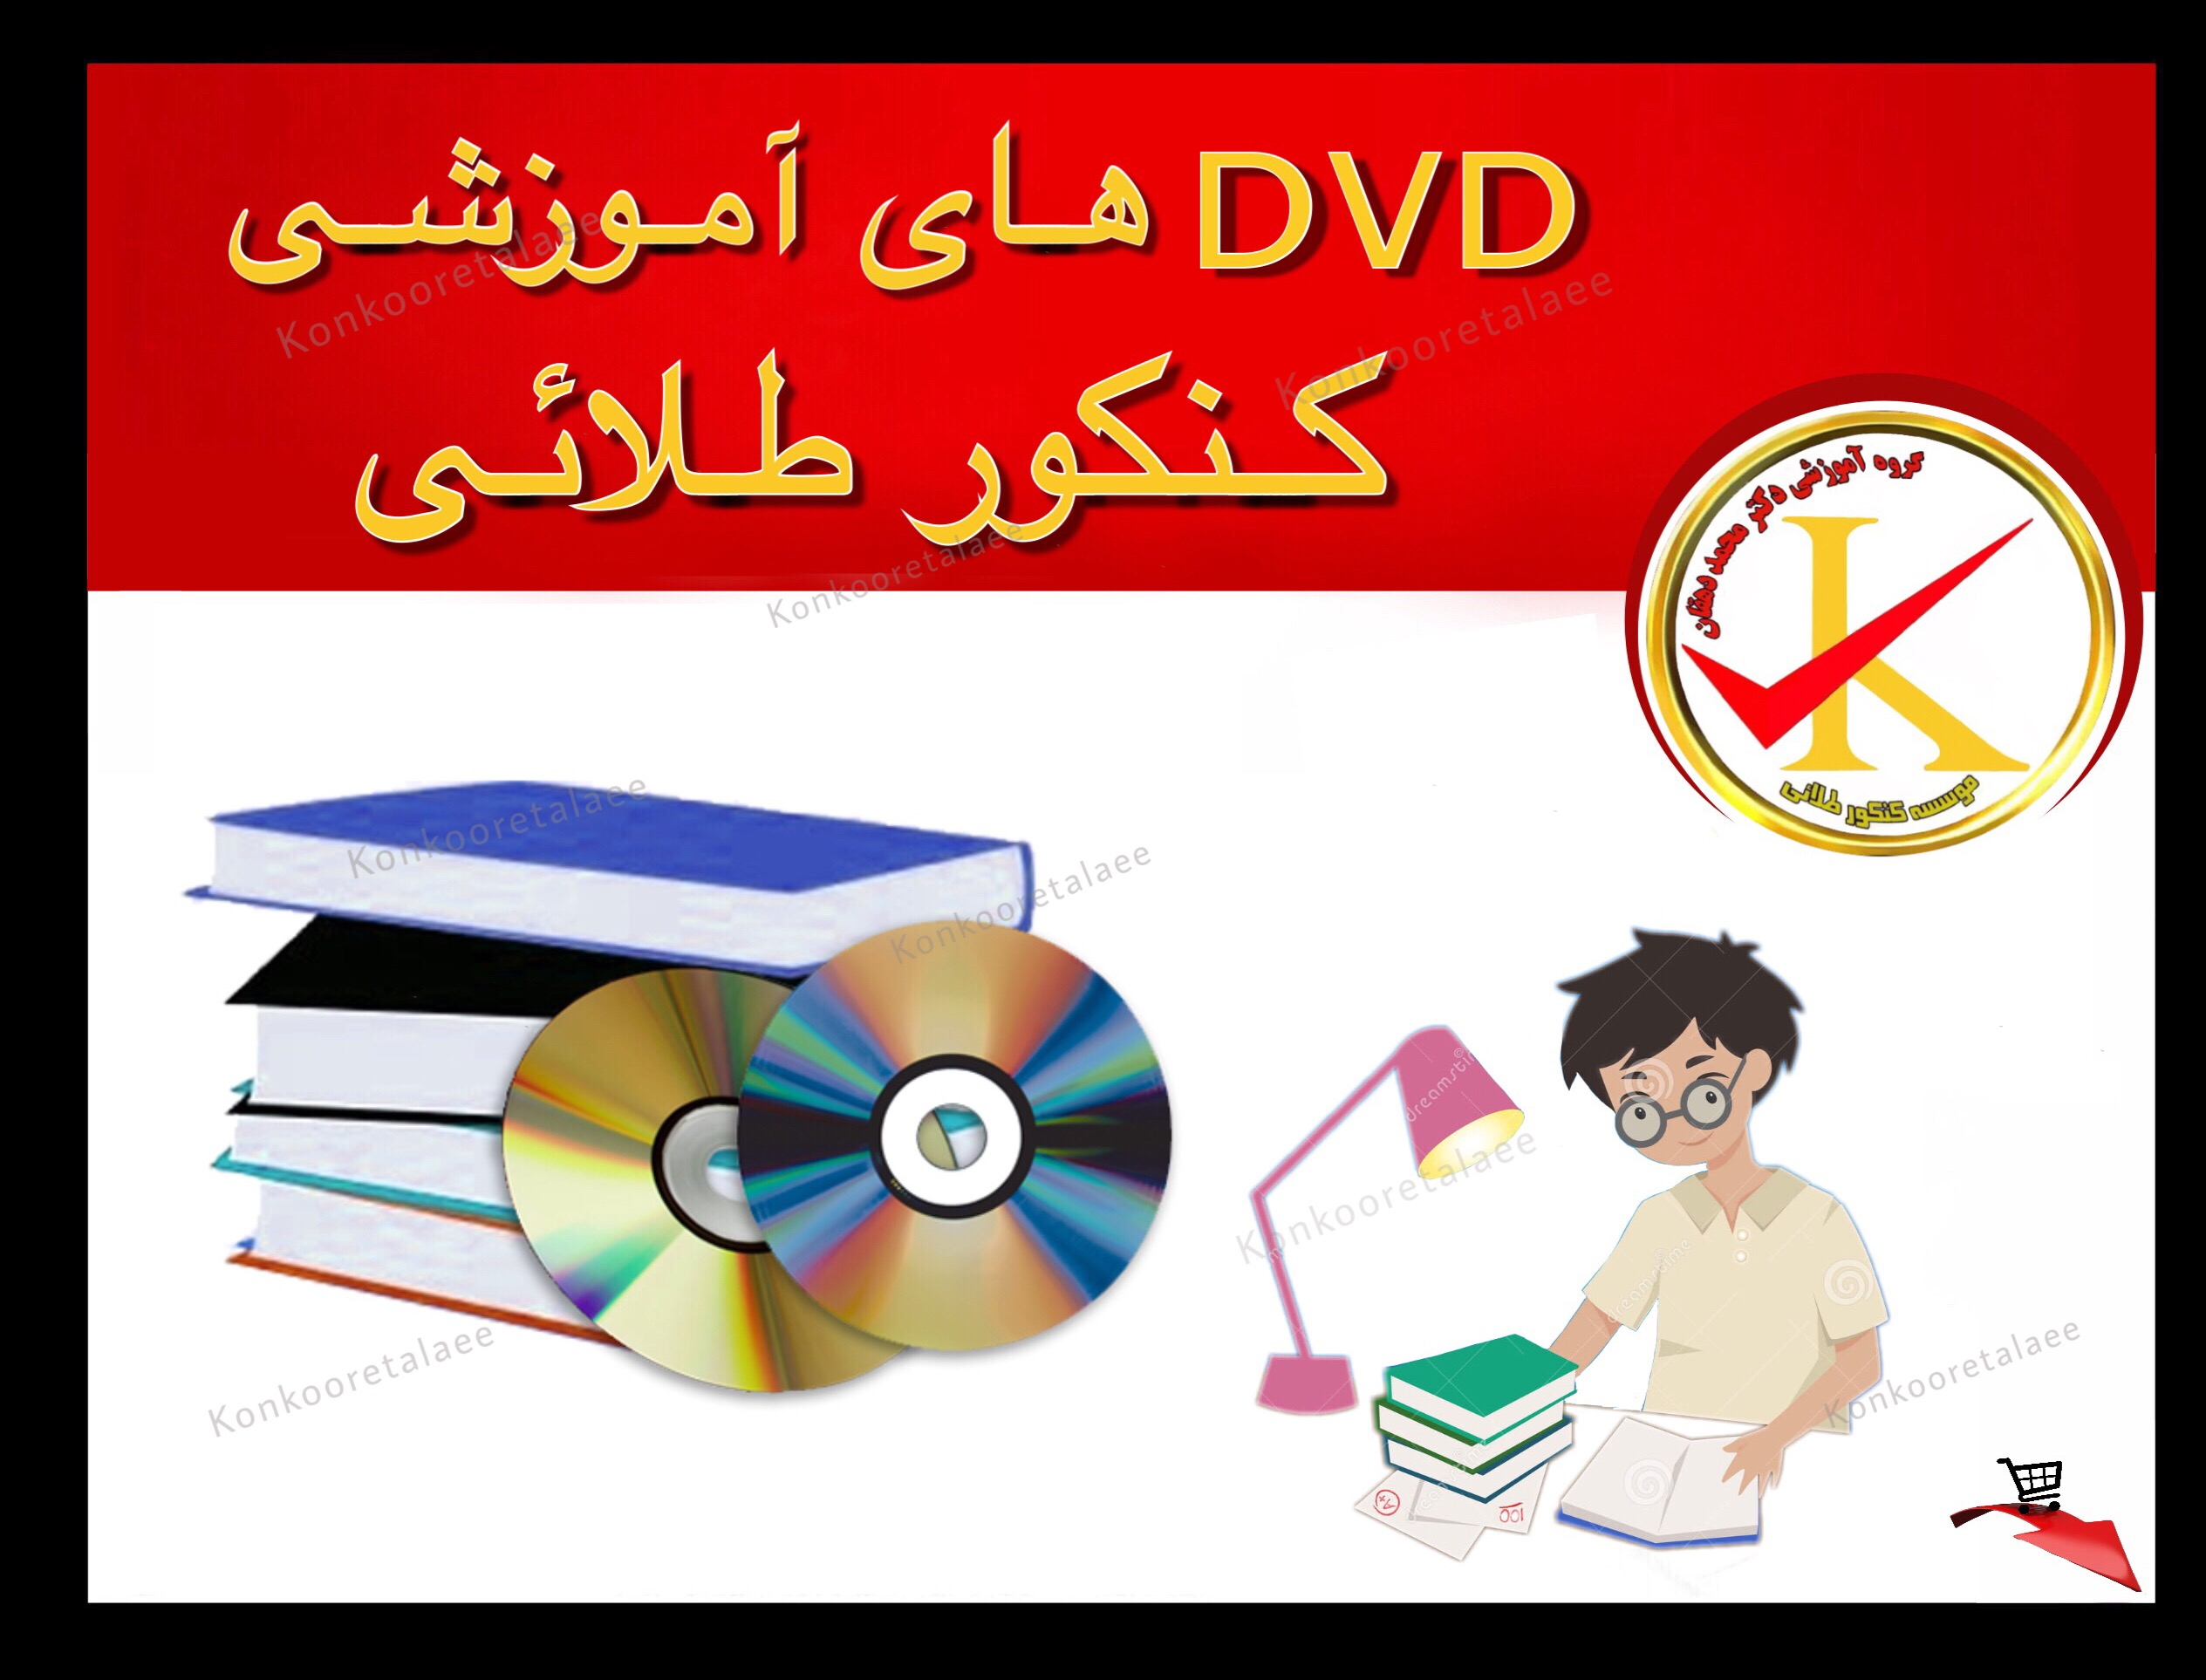 DVD.edit.11